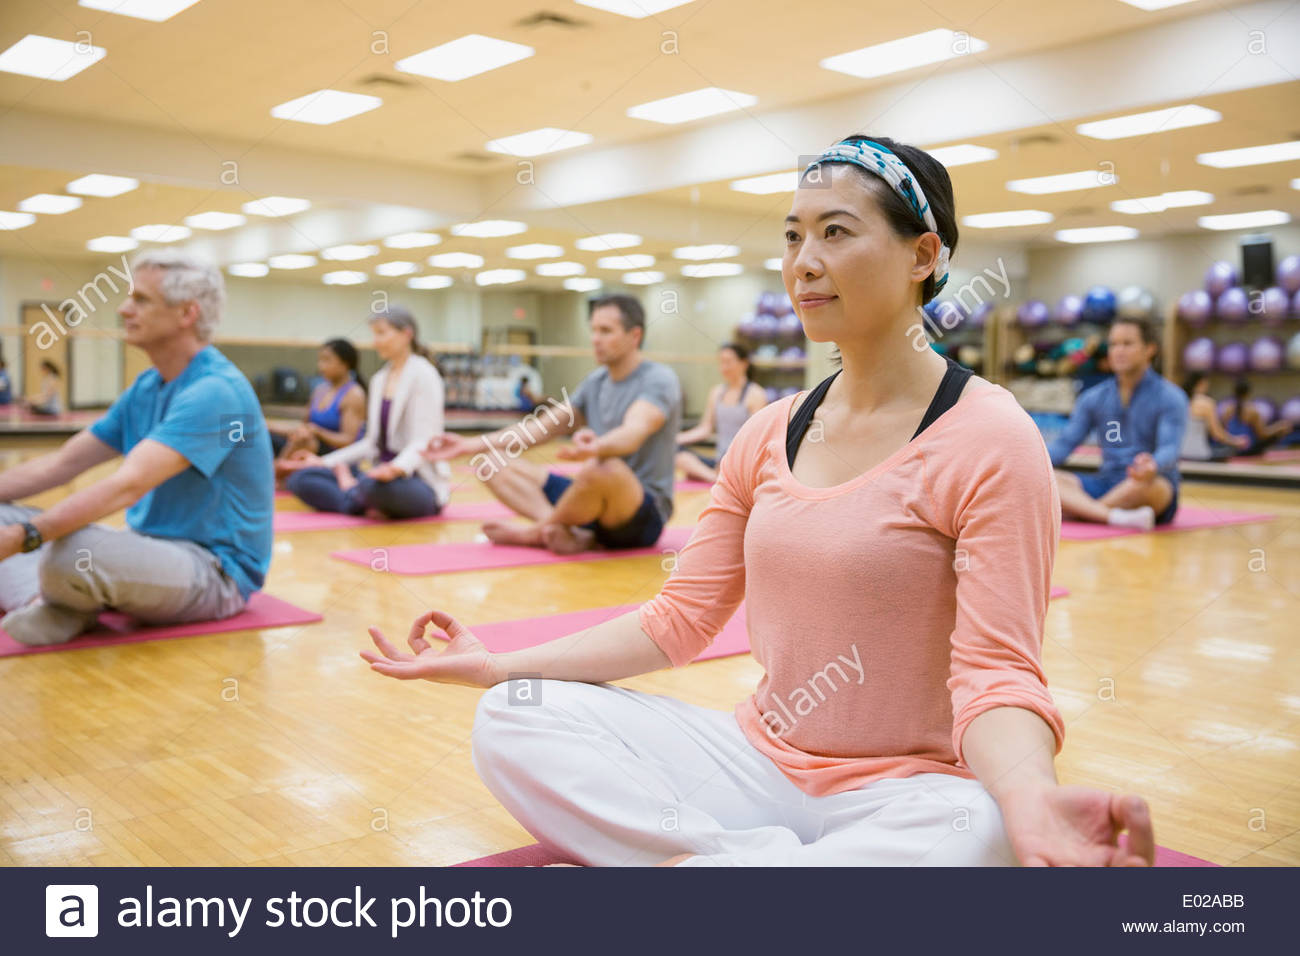 Grupo en posición de loto en clase de yoga Imagen De Stock